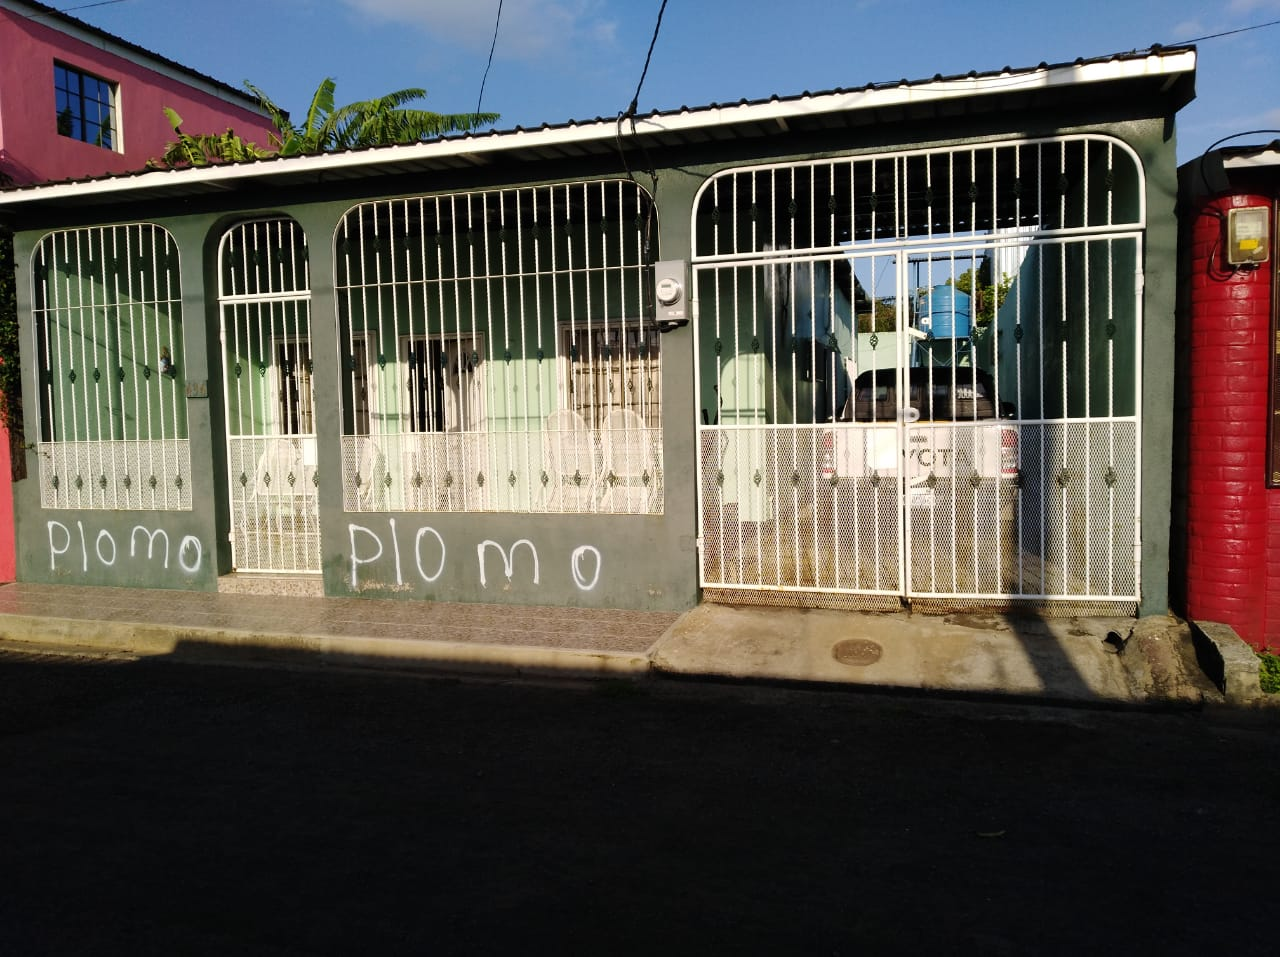 Pintas en la vivienda de la abogada Leyla Prado, quien se vio obligada a exiliarse. Foto: La Prensa